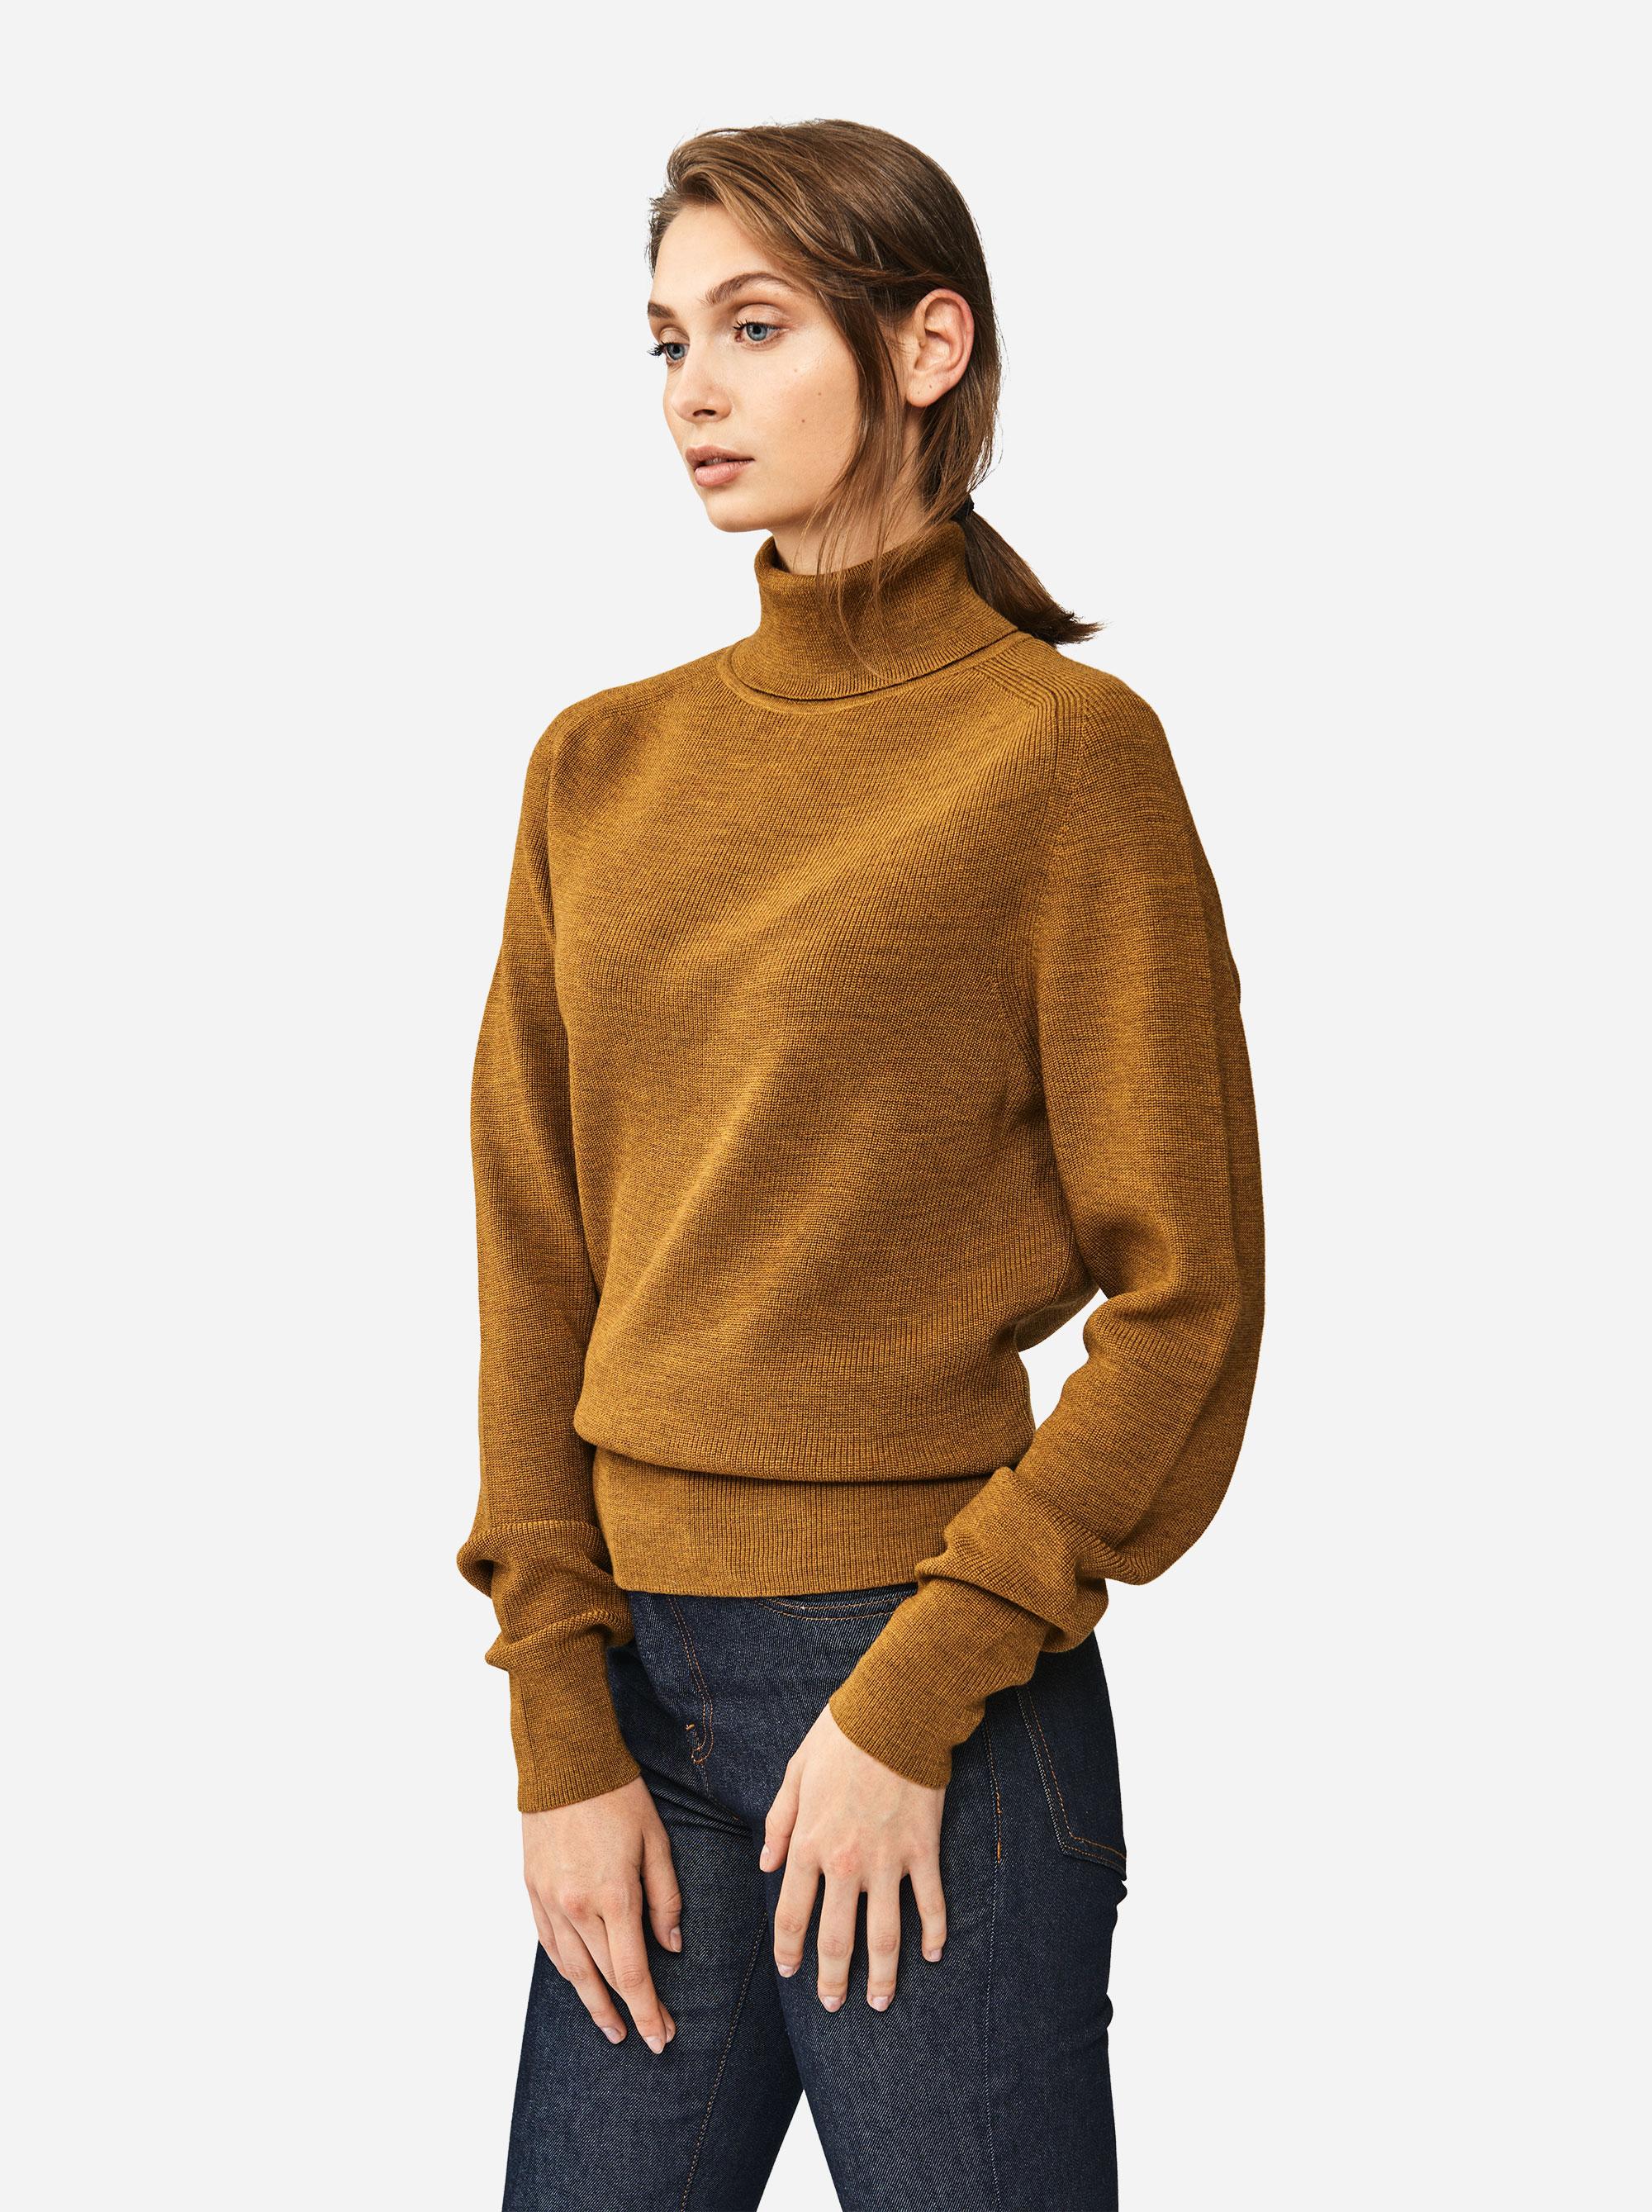 Teym - Turtleneck - The Merino Sweater - Women - Camel - 1